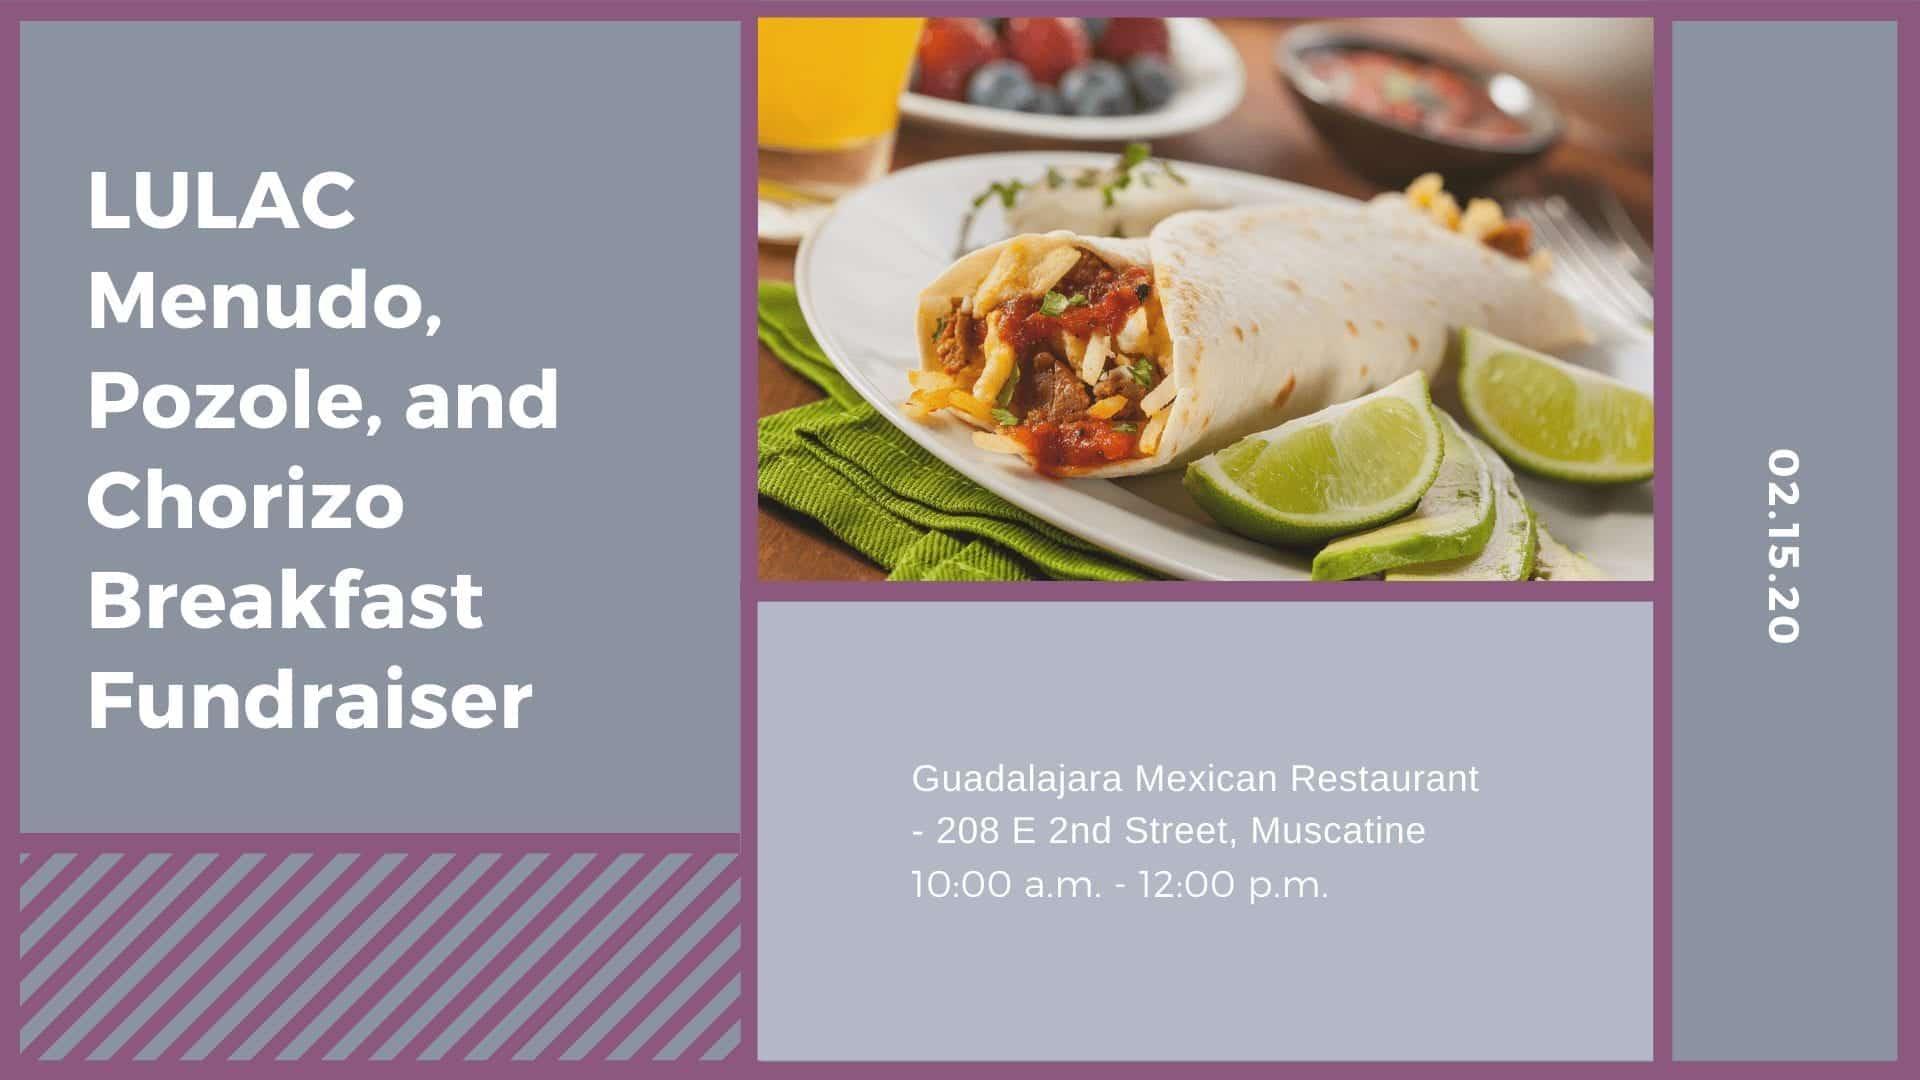 LULAC Menudo, Pozole, and Chorizo Breakfast Fundraiser